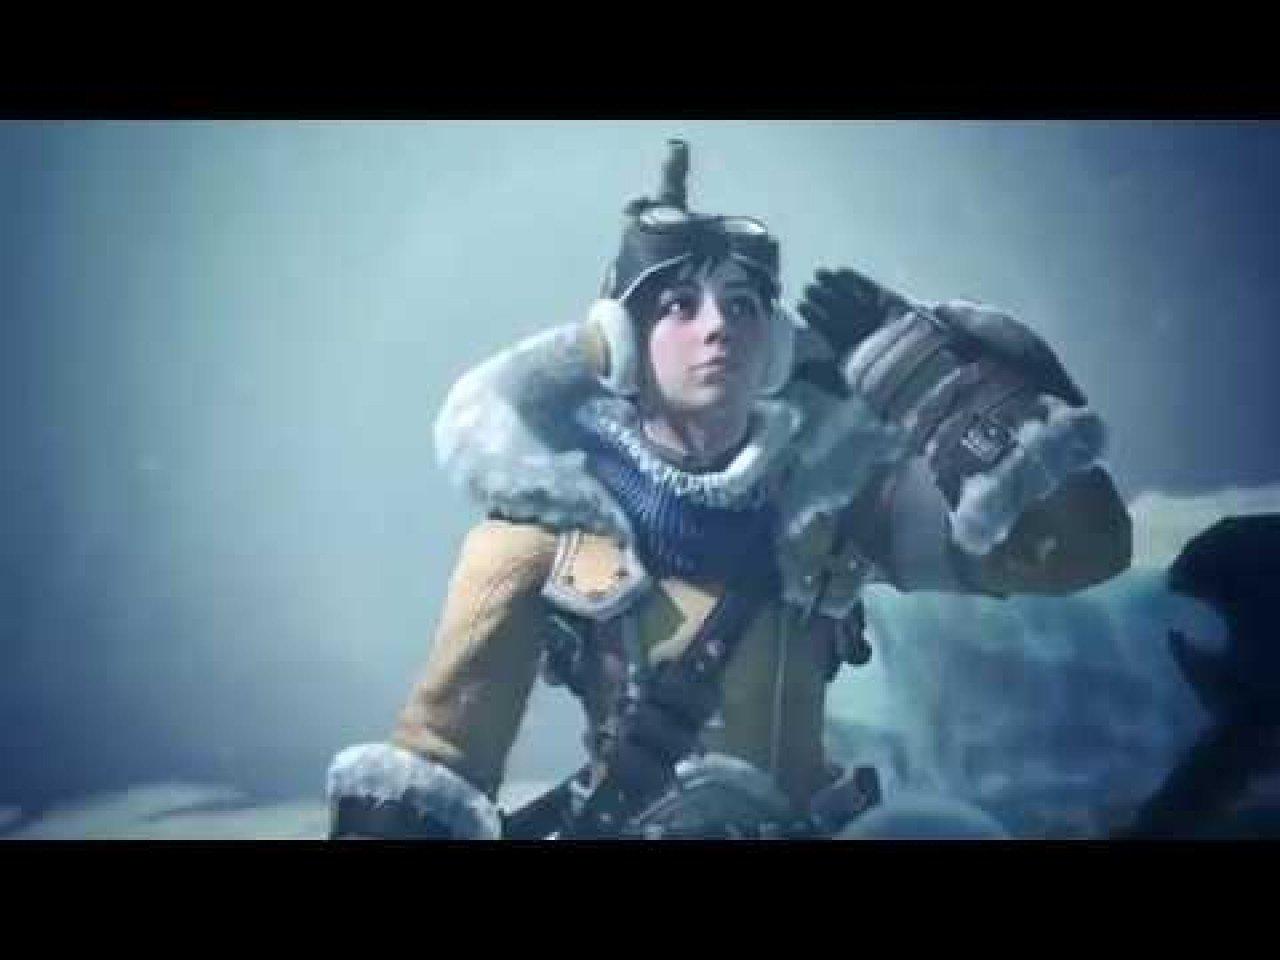 52a715aef5 To PlayStation State of Play broadcast ξεκίνησε με ένα εκτεταμενο trailer  για το Monster Hunter World  Iceborne.